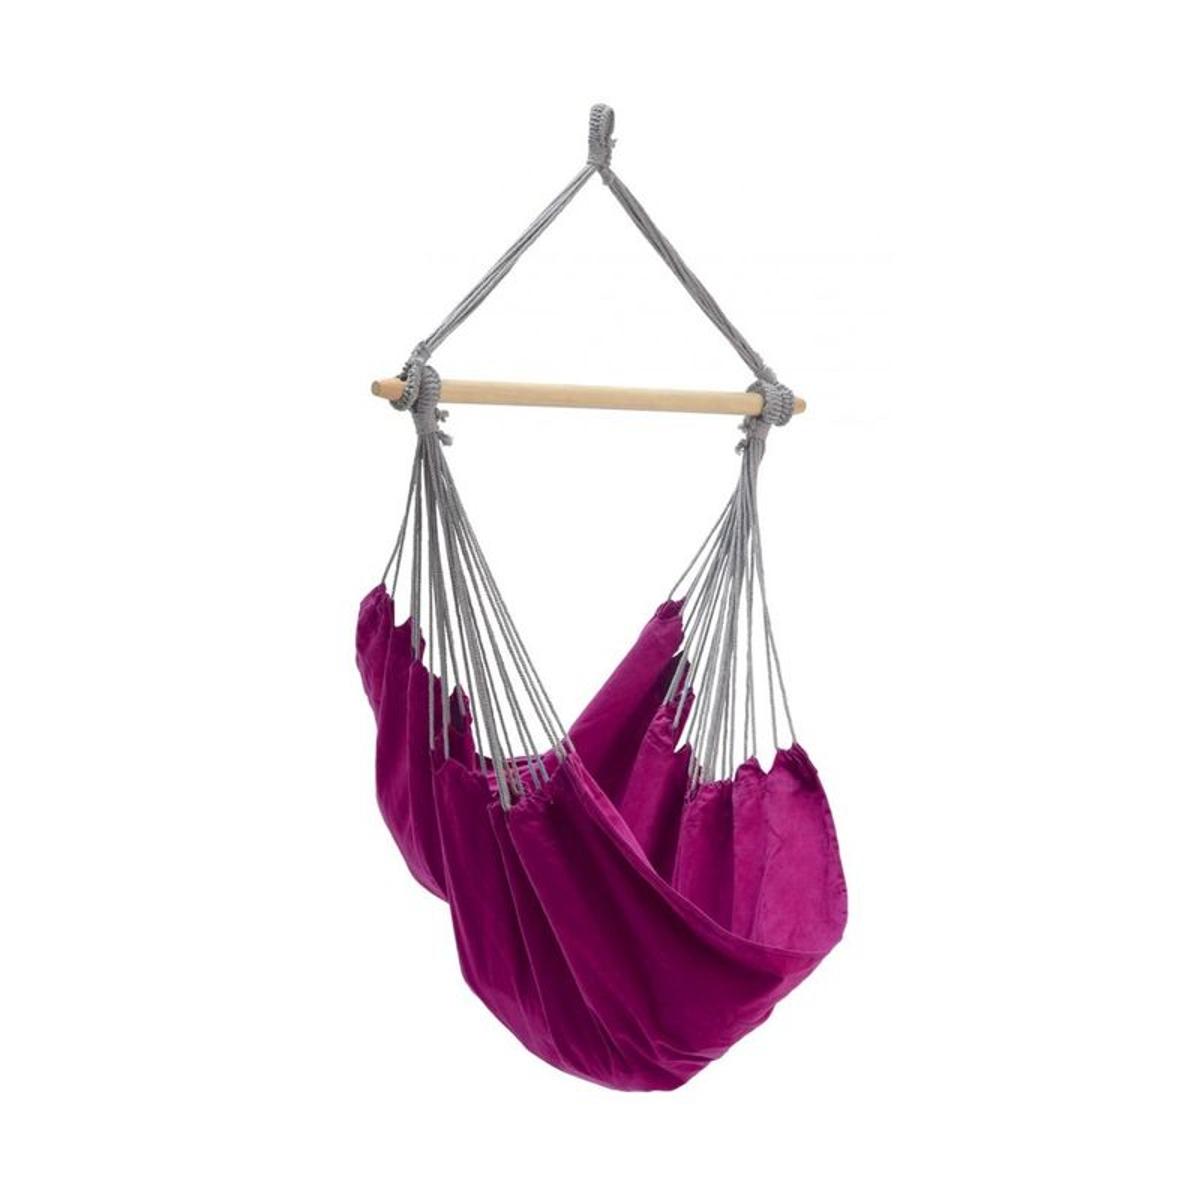 Panama Berry : hamac chaise Basique